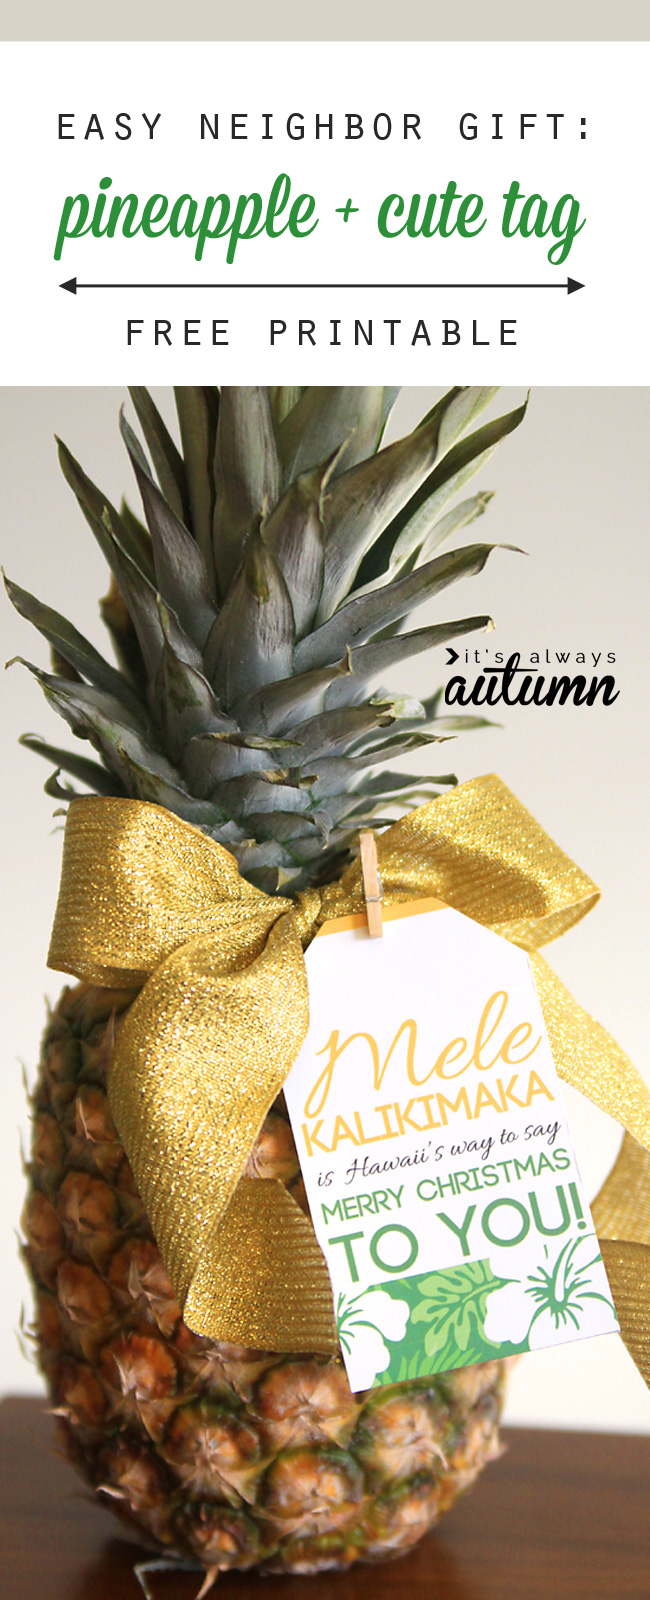 Easy Neighbor Gift Idea Pineapple Cute Tag Its